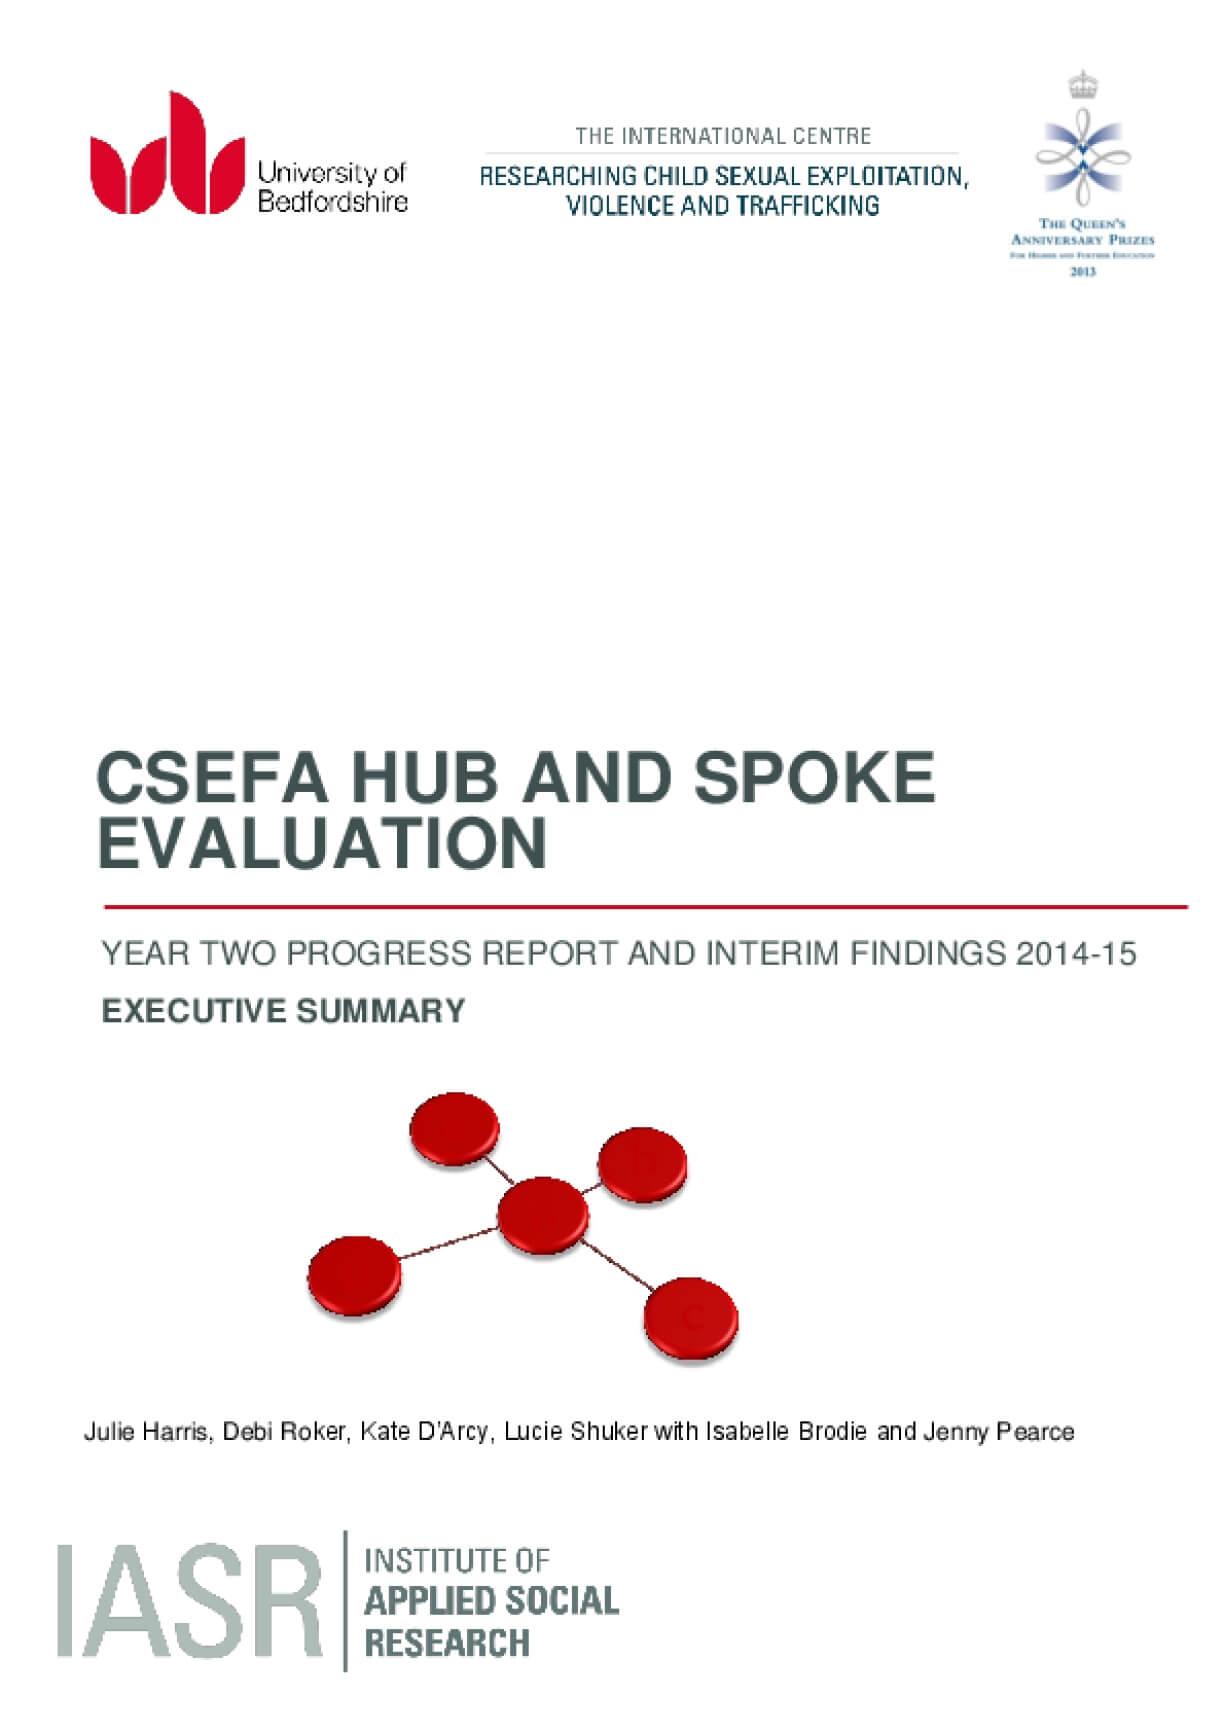 CSEFA Hub and Spoke Evaluation Executive Summary